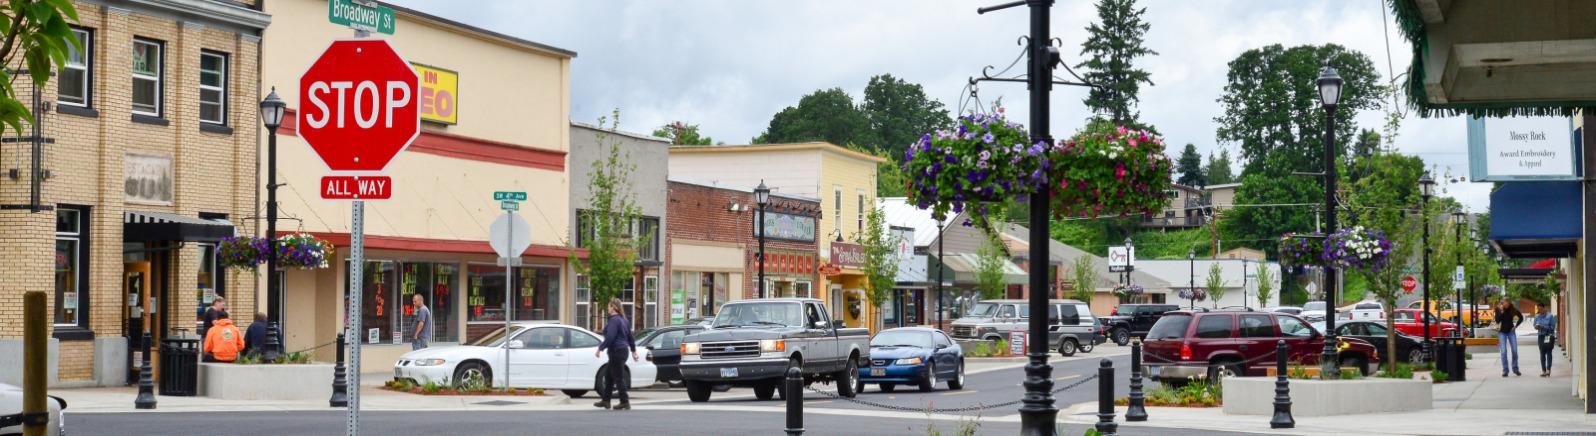 Downtown Estacada - Broadway Street